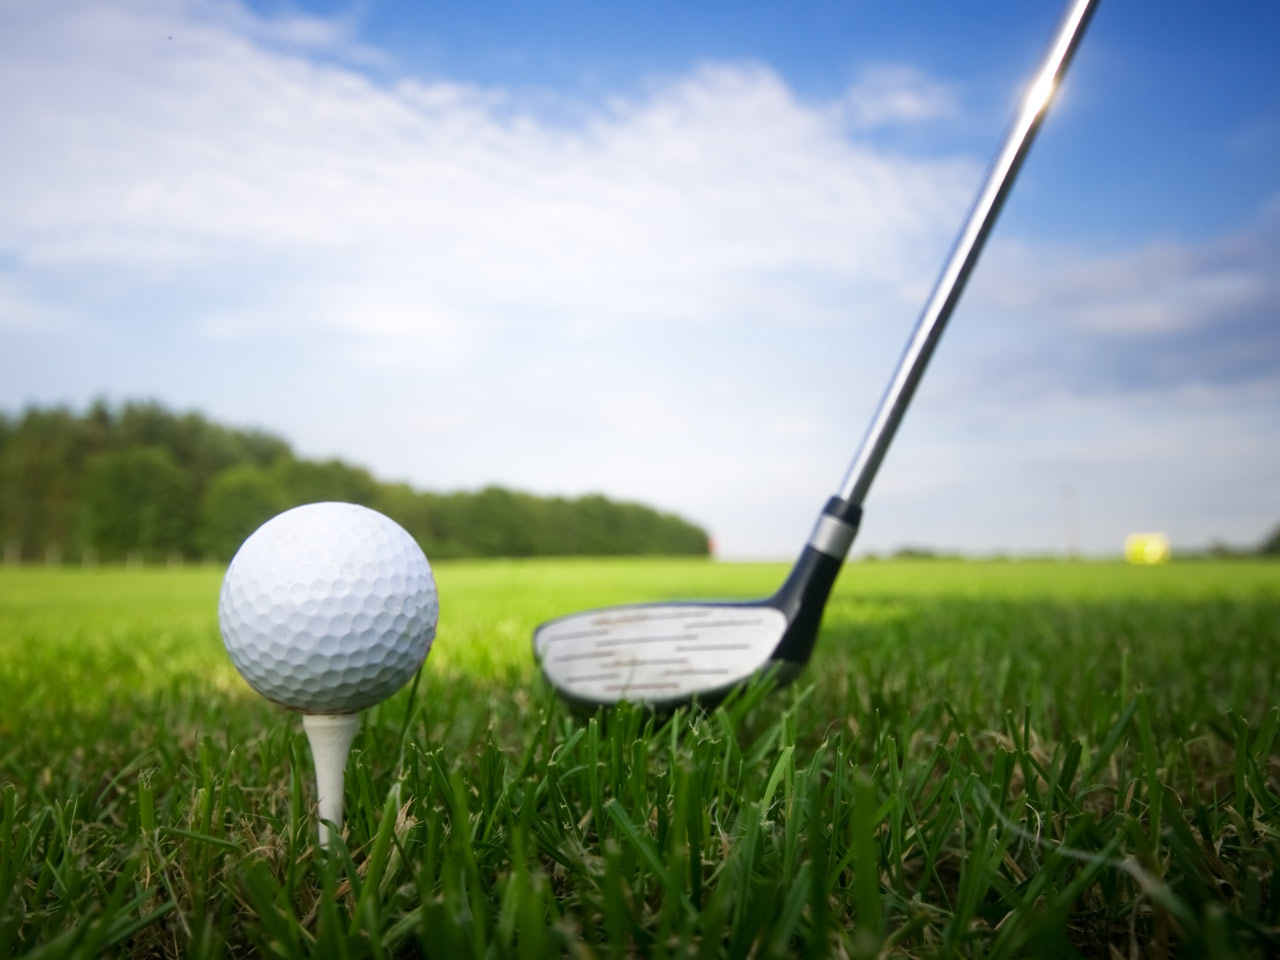 super hd golf image